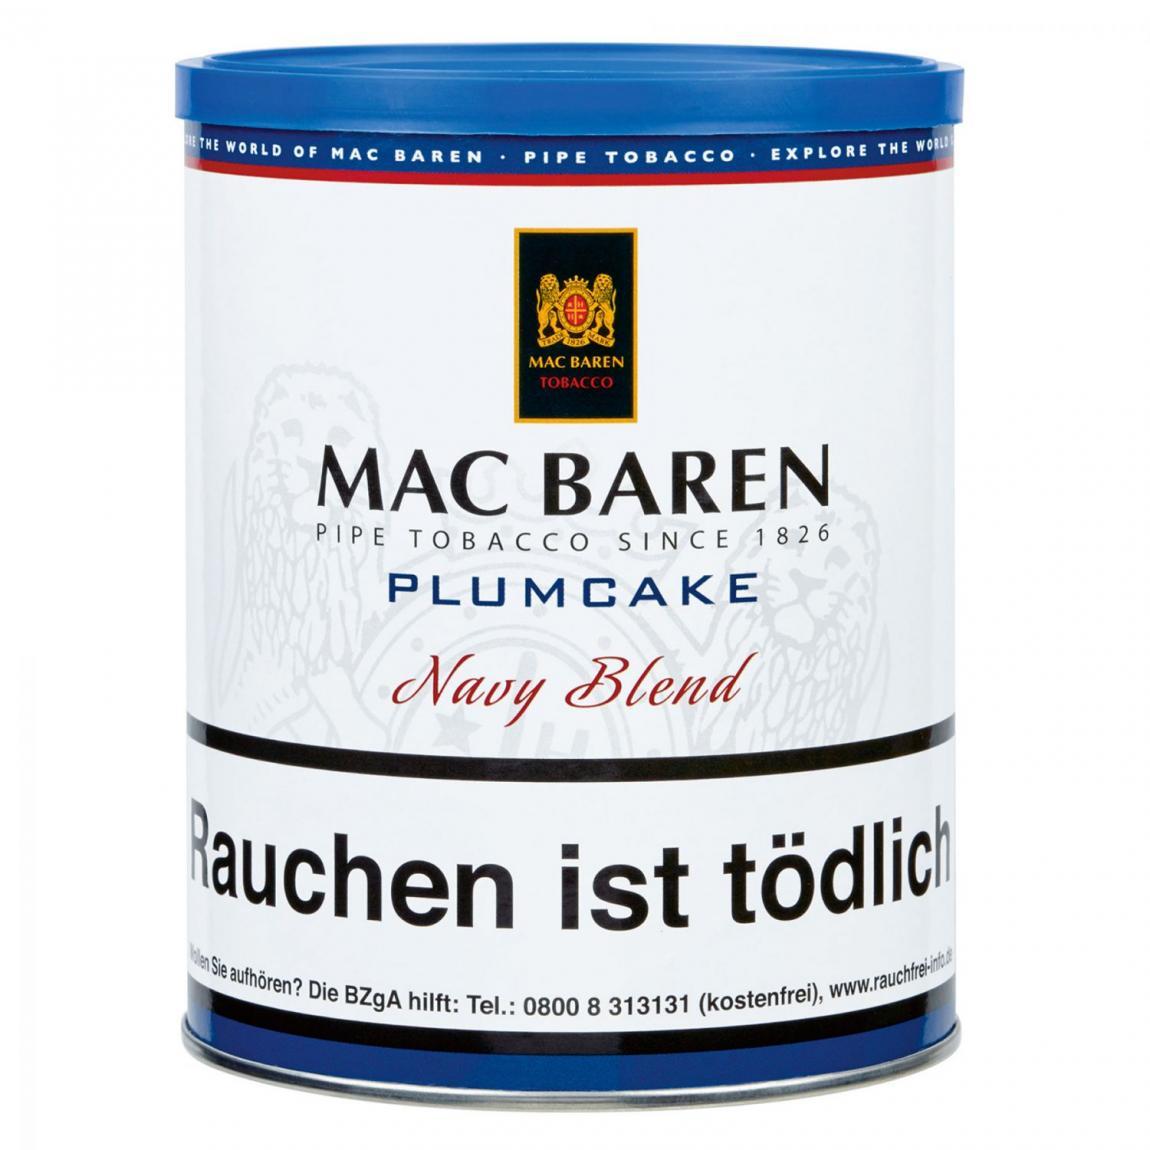 Mac Baren »Plumcake« Navy Blend 250g Dose